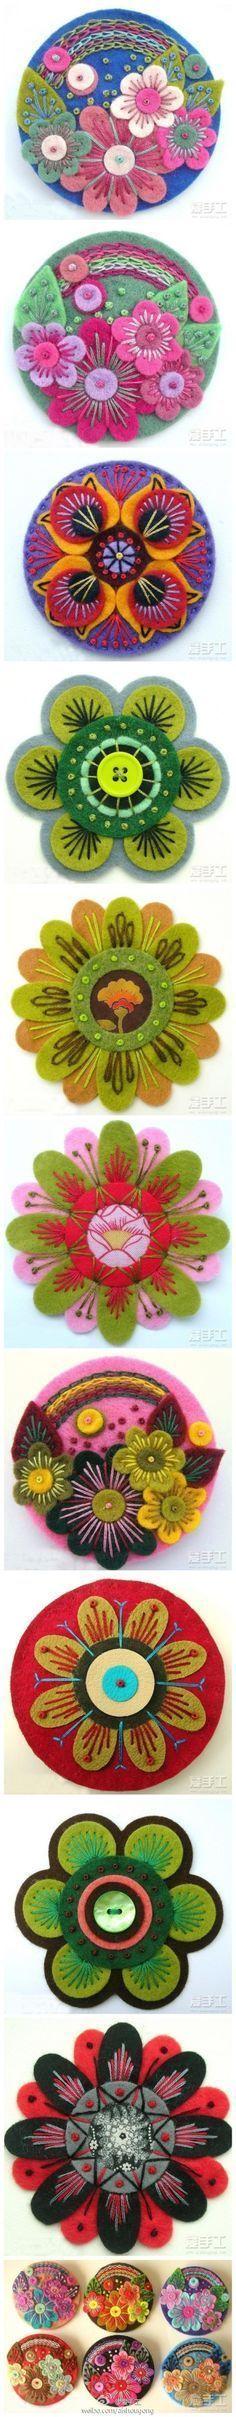 I love wool felt embroidery Fabric Art, Fabric Crafts, Sewing Crafts, Sewing Projects, Sewing Art, Art Projects, Felt Diy, Felt Crafts, Felt Flowers